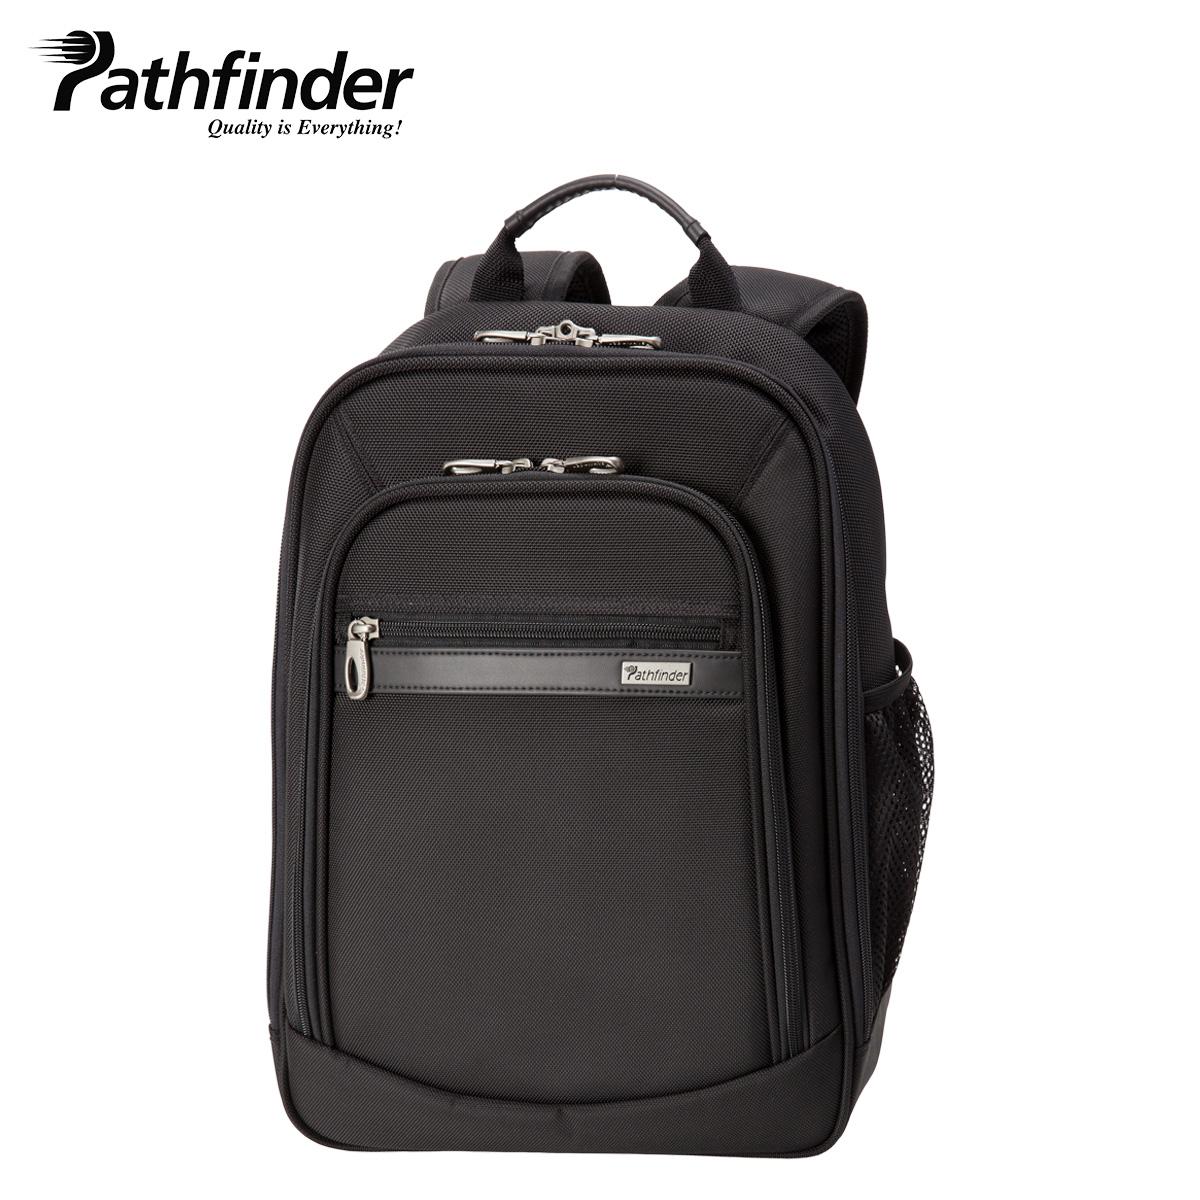 Pathfinder AVENGER パスファインダー バッグ ビジネスバッグ リュック バックパック メンズ ブラック 黒 PF1808B